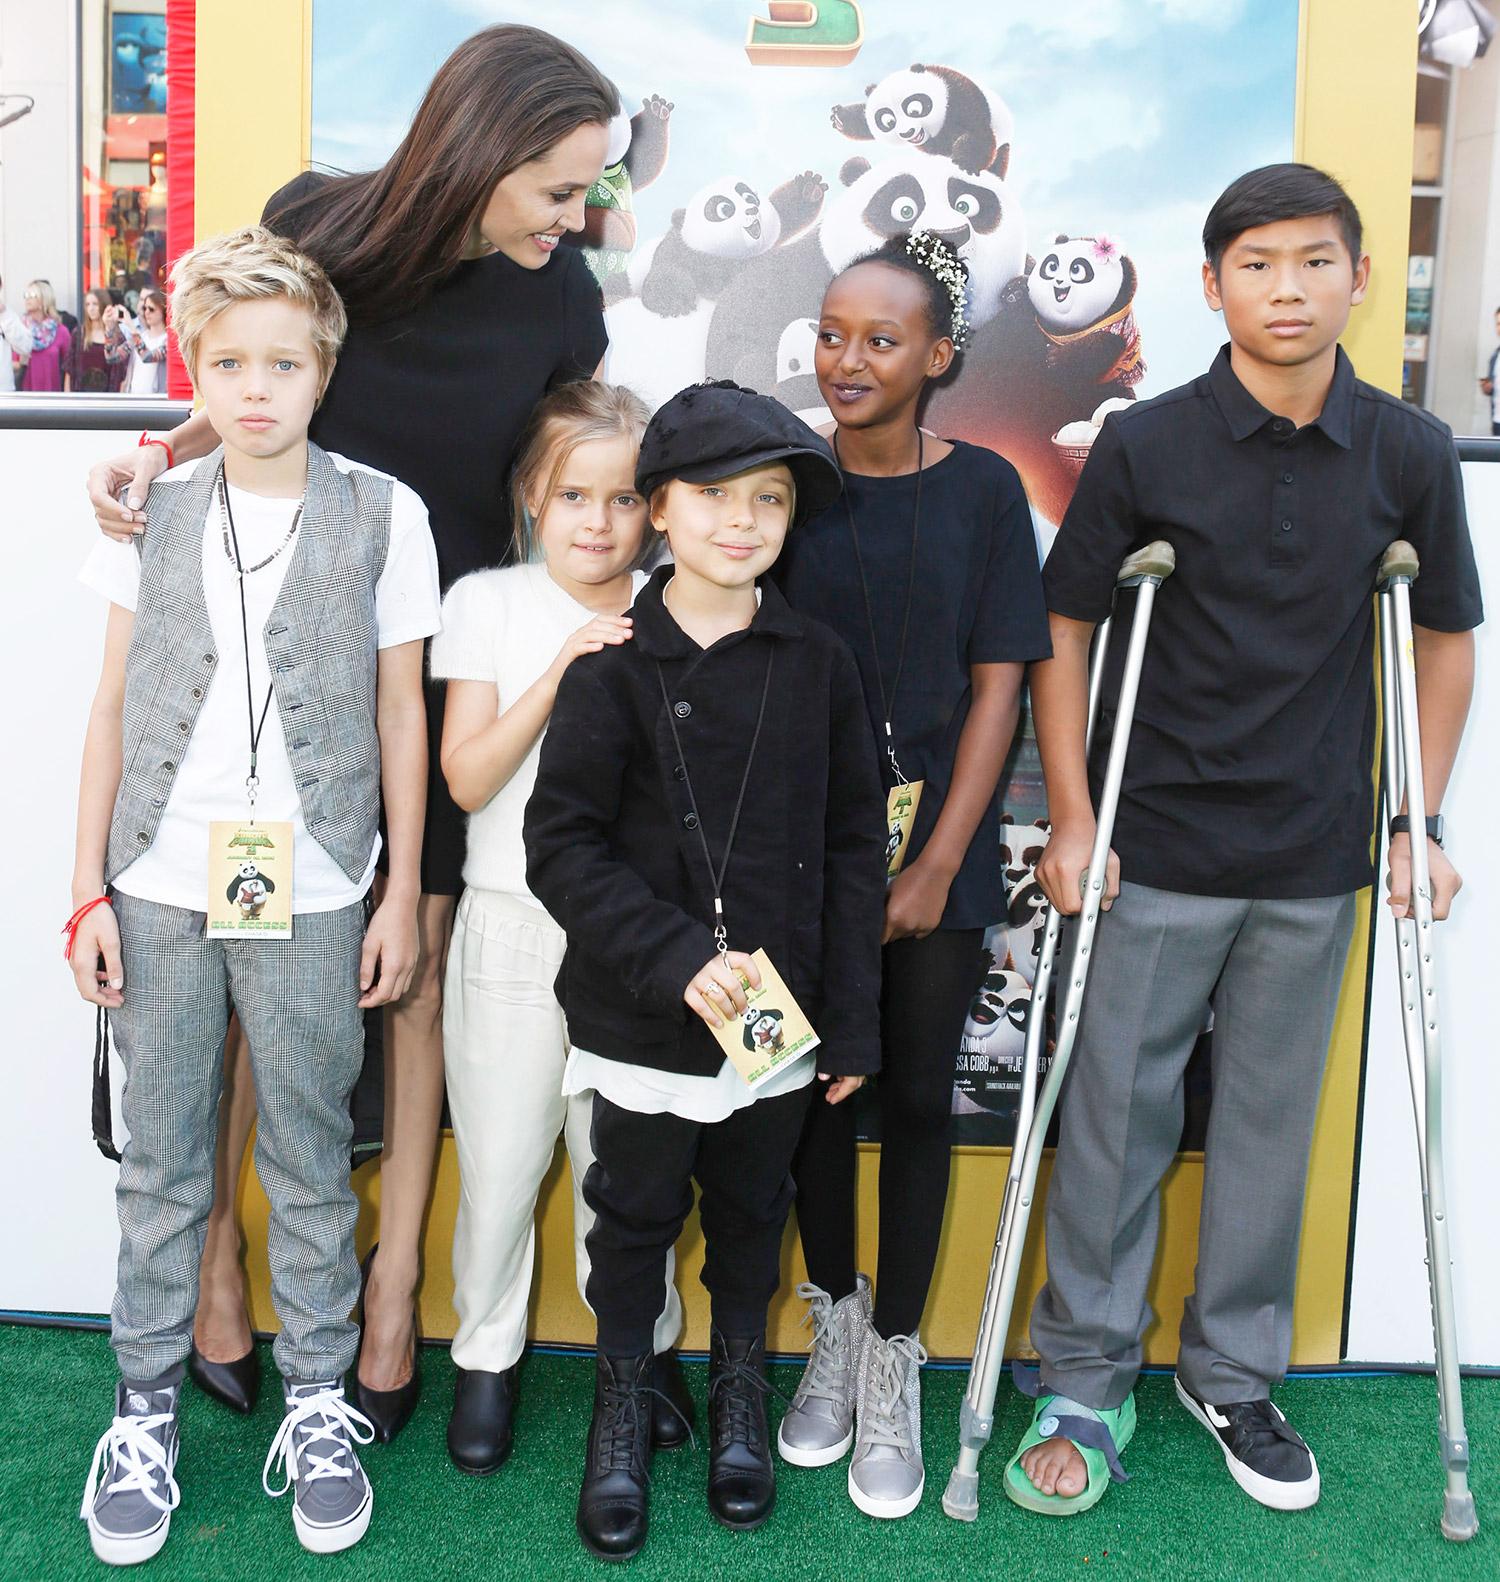 Shiloh Jolie-Pitt, Angelina Jolie, Vivienne Marcheline Jolie-Pitt, Knox Leon Jolie-Pitt, Zahara Marley Jolie-Pitt and Pax Thien Jolie-Pitt